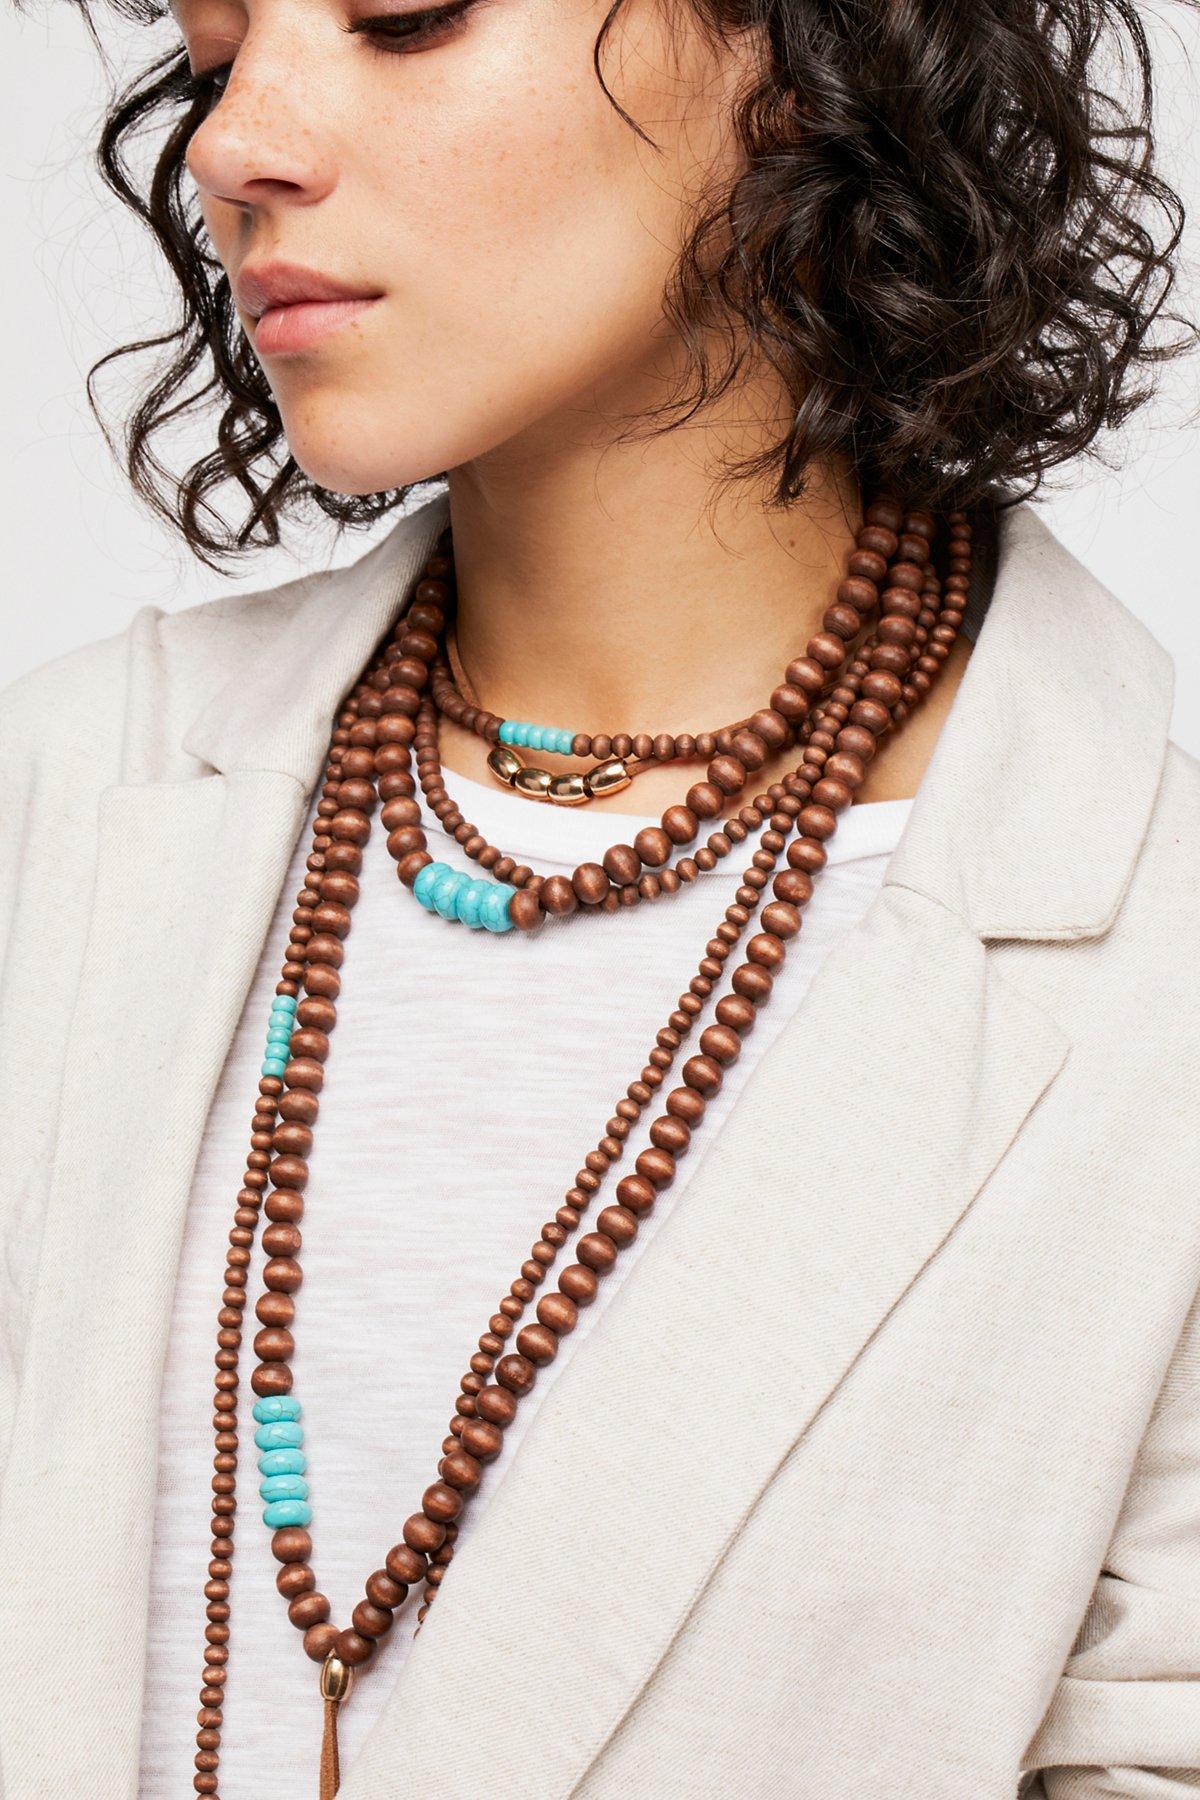 Tibetan Sunrise Necklace